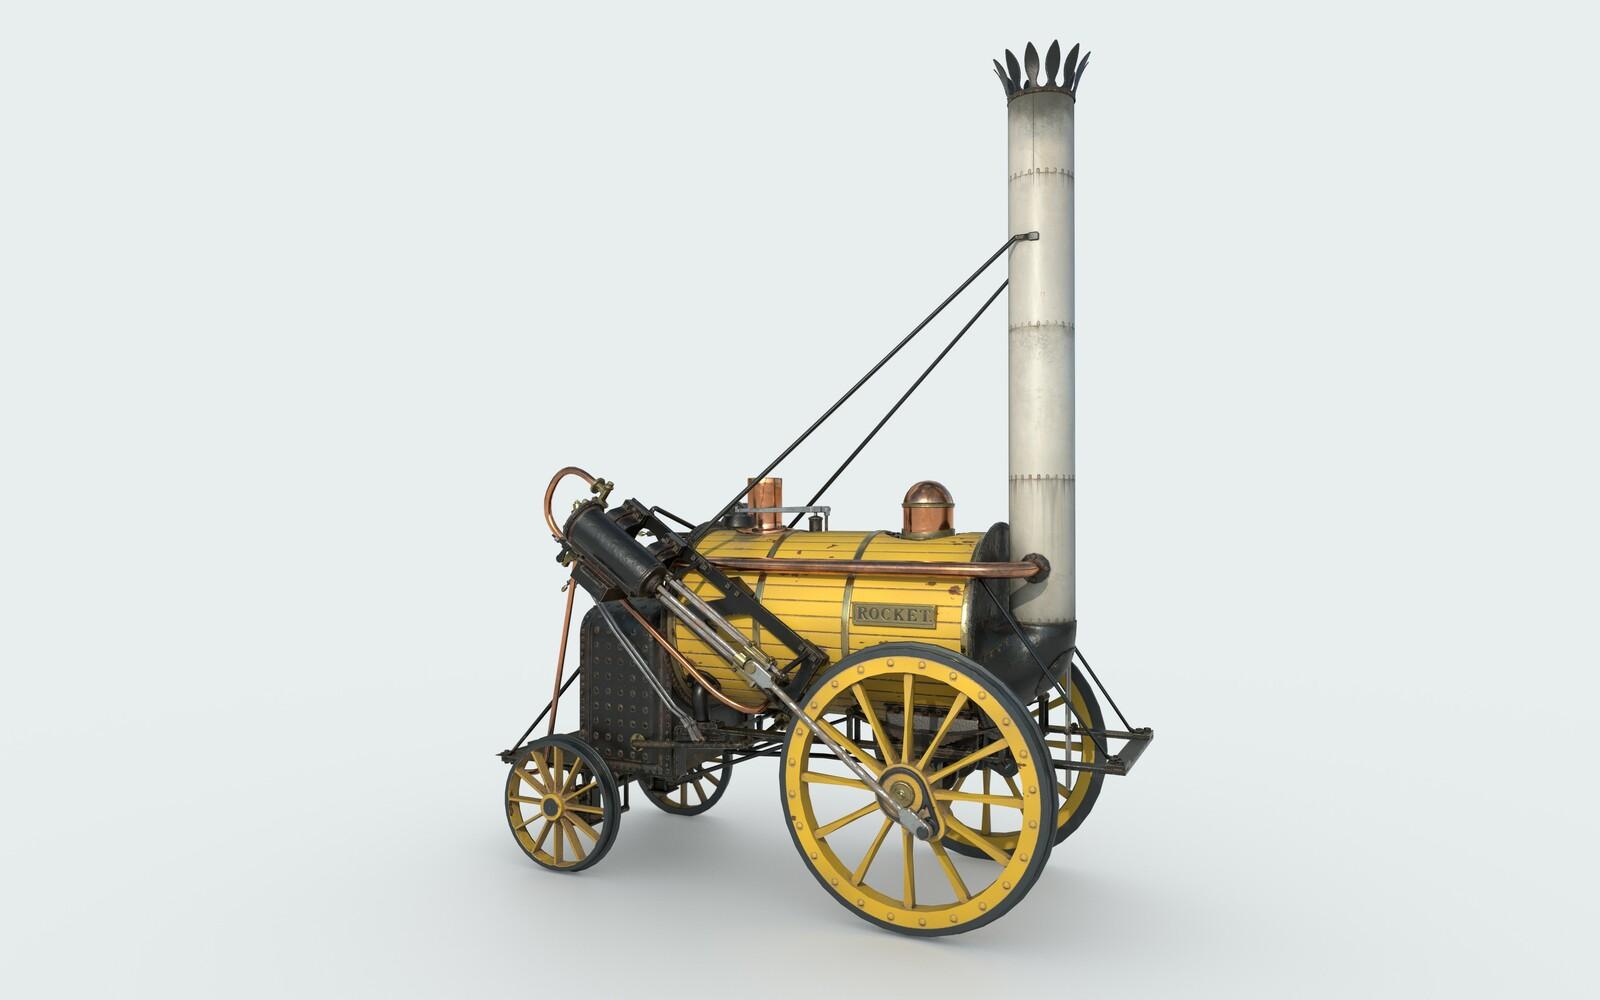 Rocket (historical train)